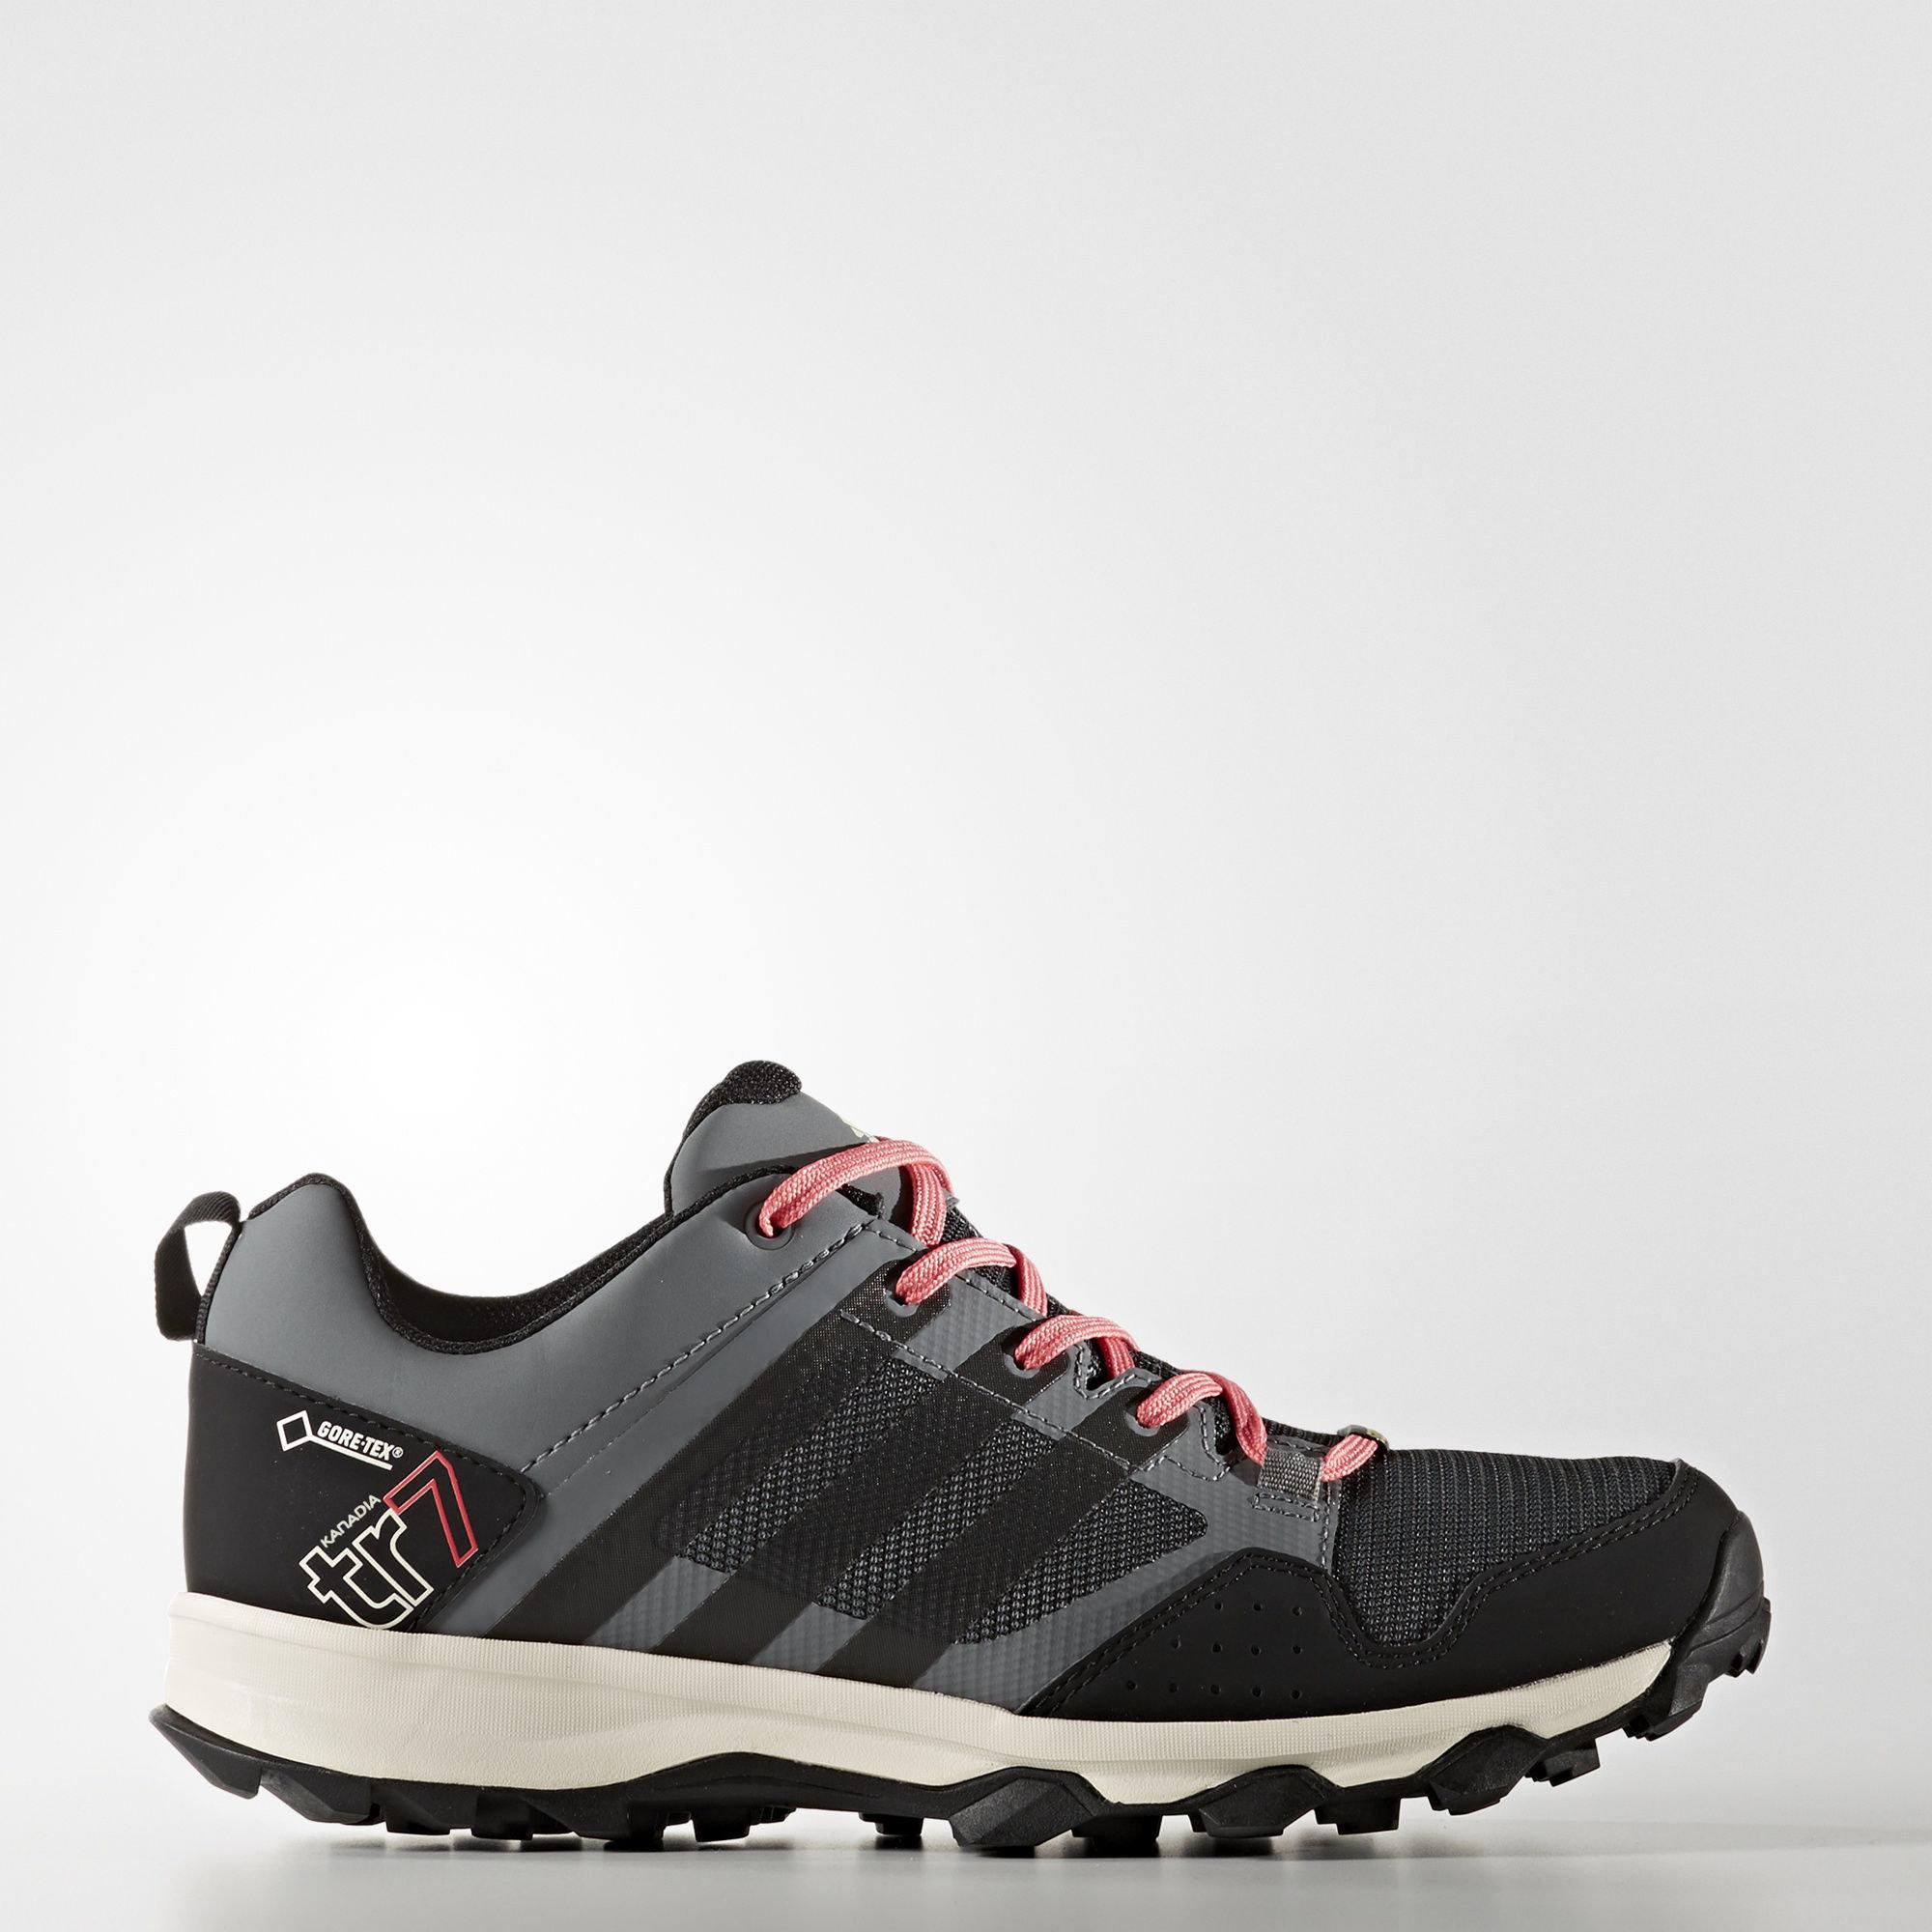 Обувь для трейлраннинга Kanadia 7 Trail GTX adidas TERREX Vista Grey S15 / Core Black / Super Blush S16